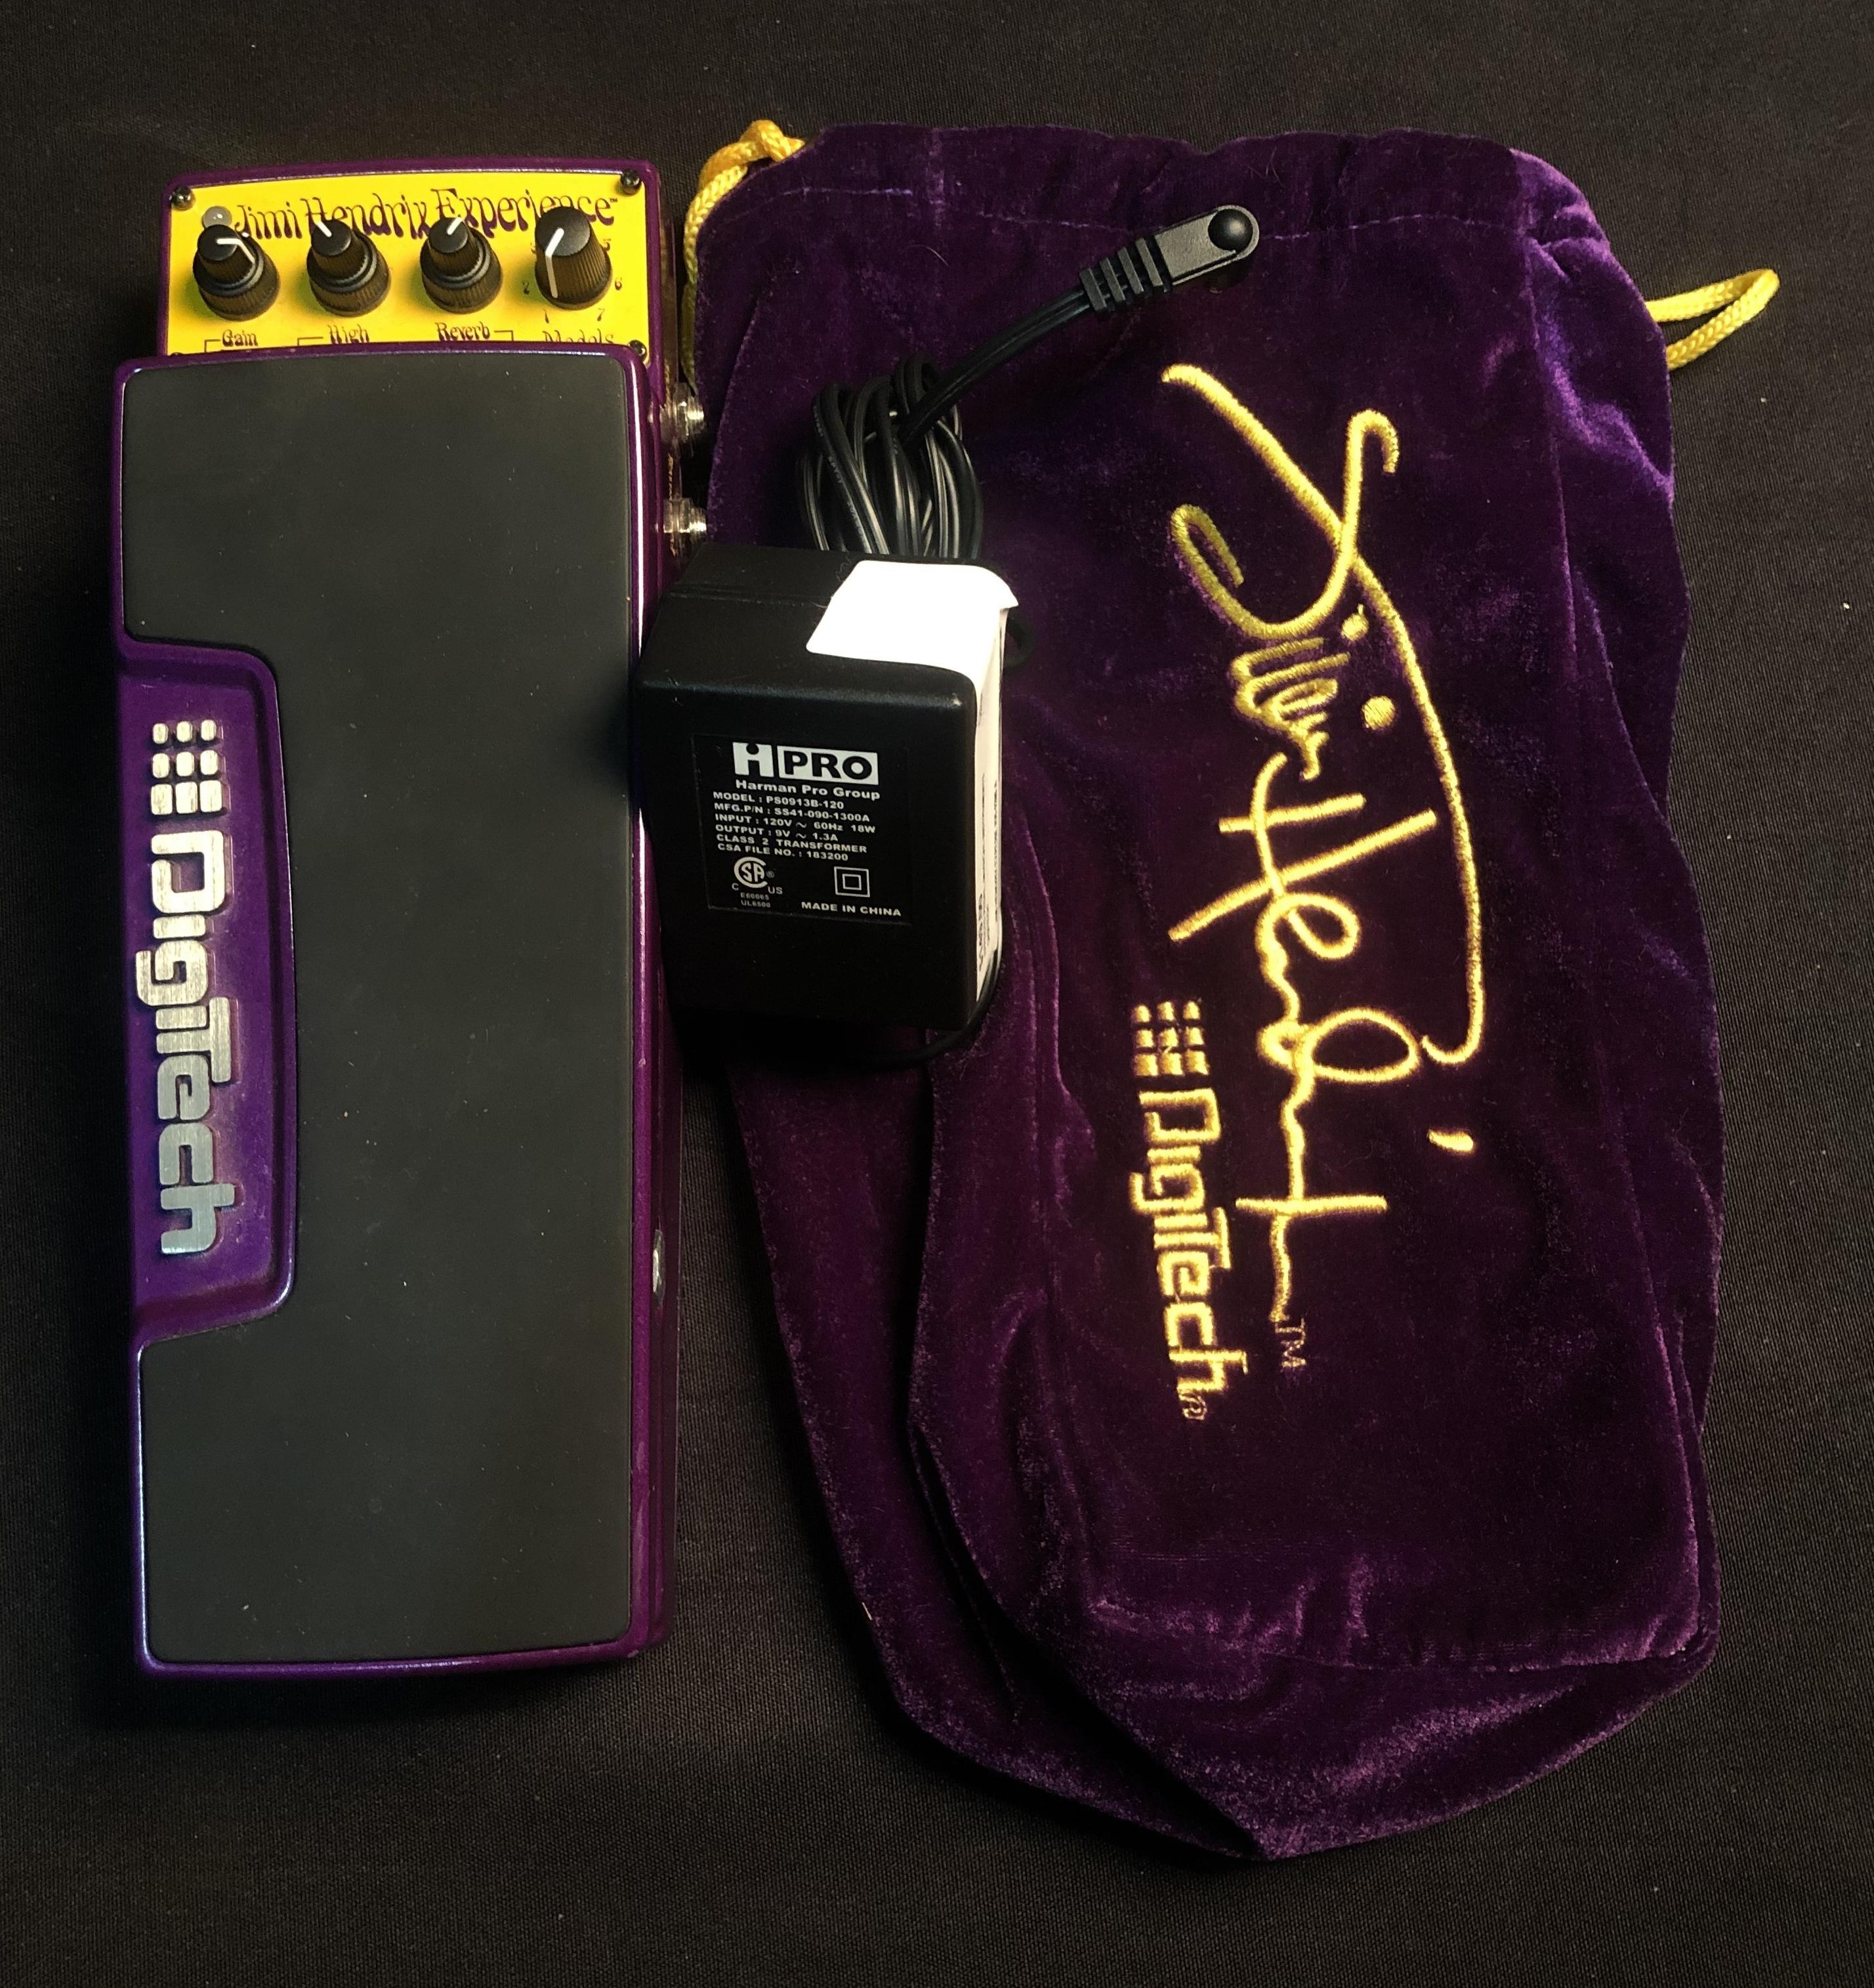 DIGITECH - Jimi Hendrix Experience Expression Pedal